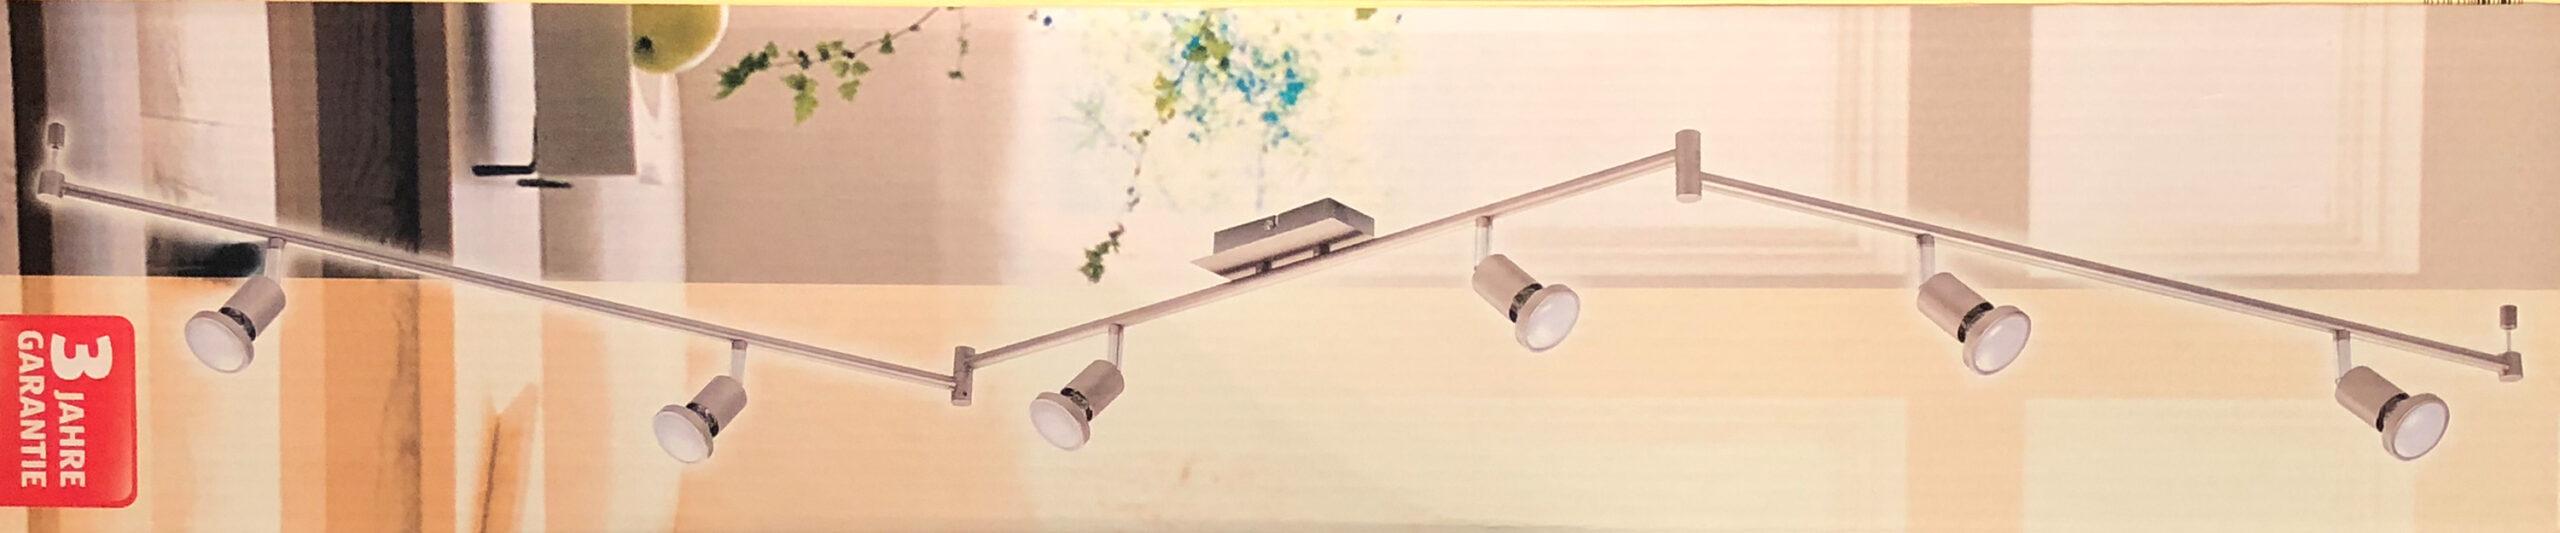 Full Size of Lampe Moderne Salon Plafond Chambre Sur Pied Ikea De A Poser Pas Cher Design Modern Wohnzimmer Ventilateur Pour Meuble Kijiji Led Deckenschiene Decken Leuchte Wohnzimmer Lampe Modern